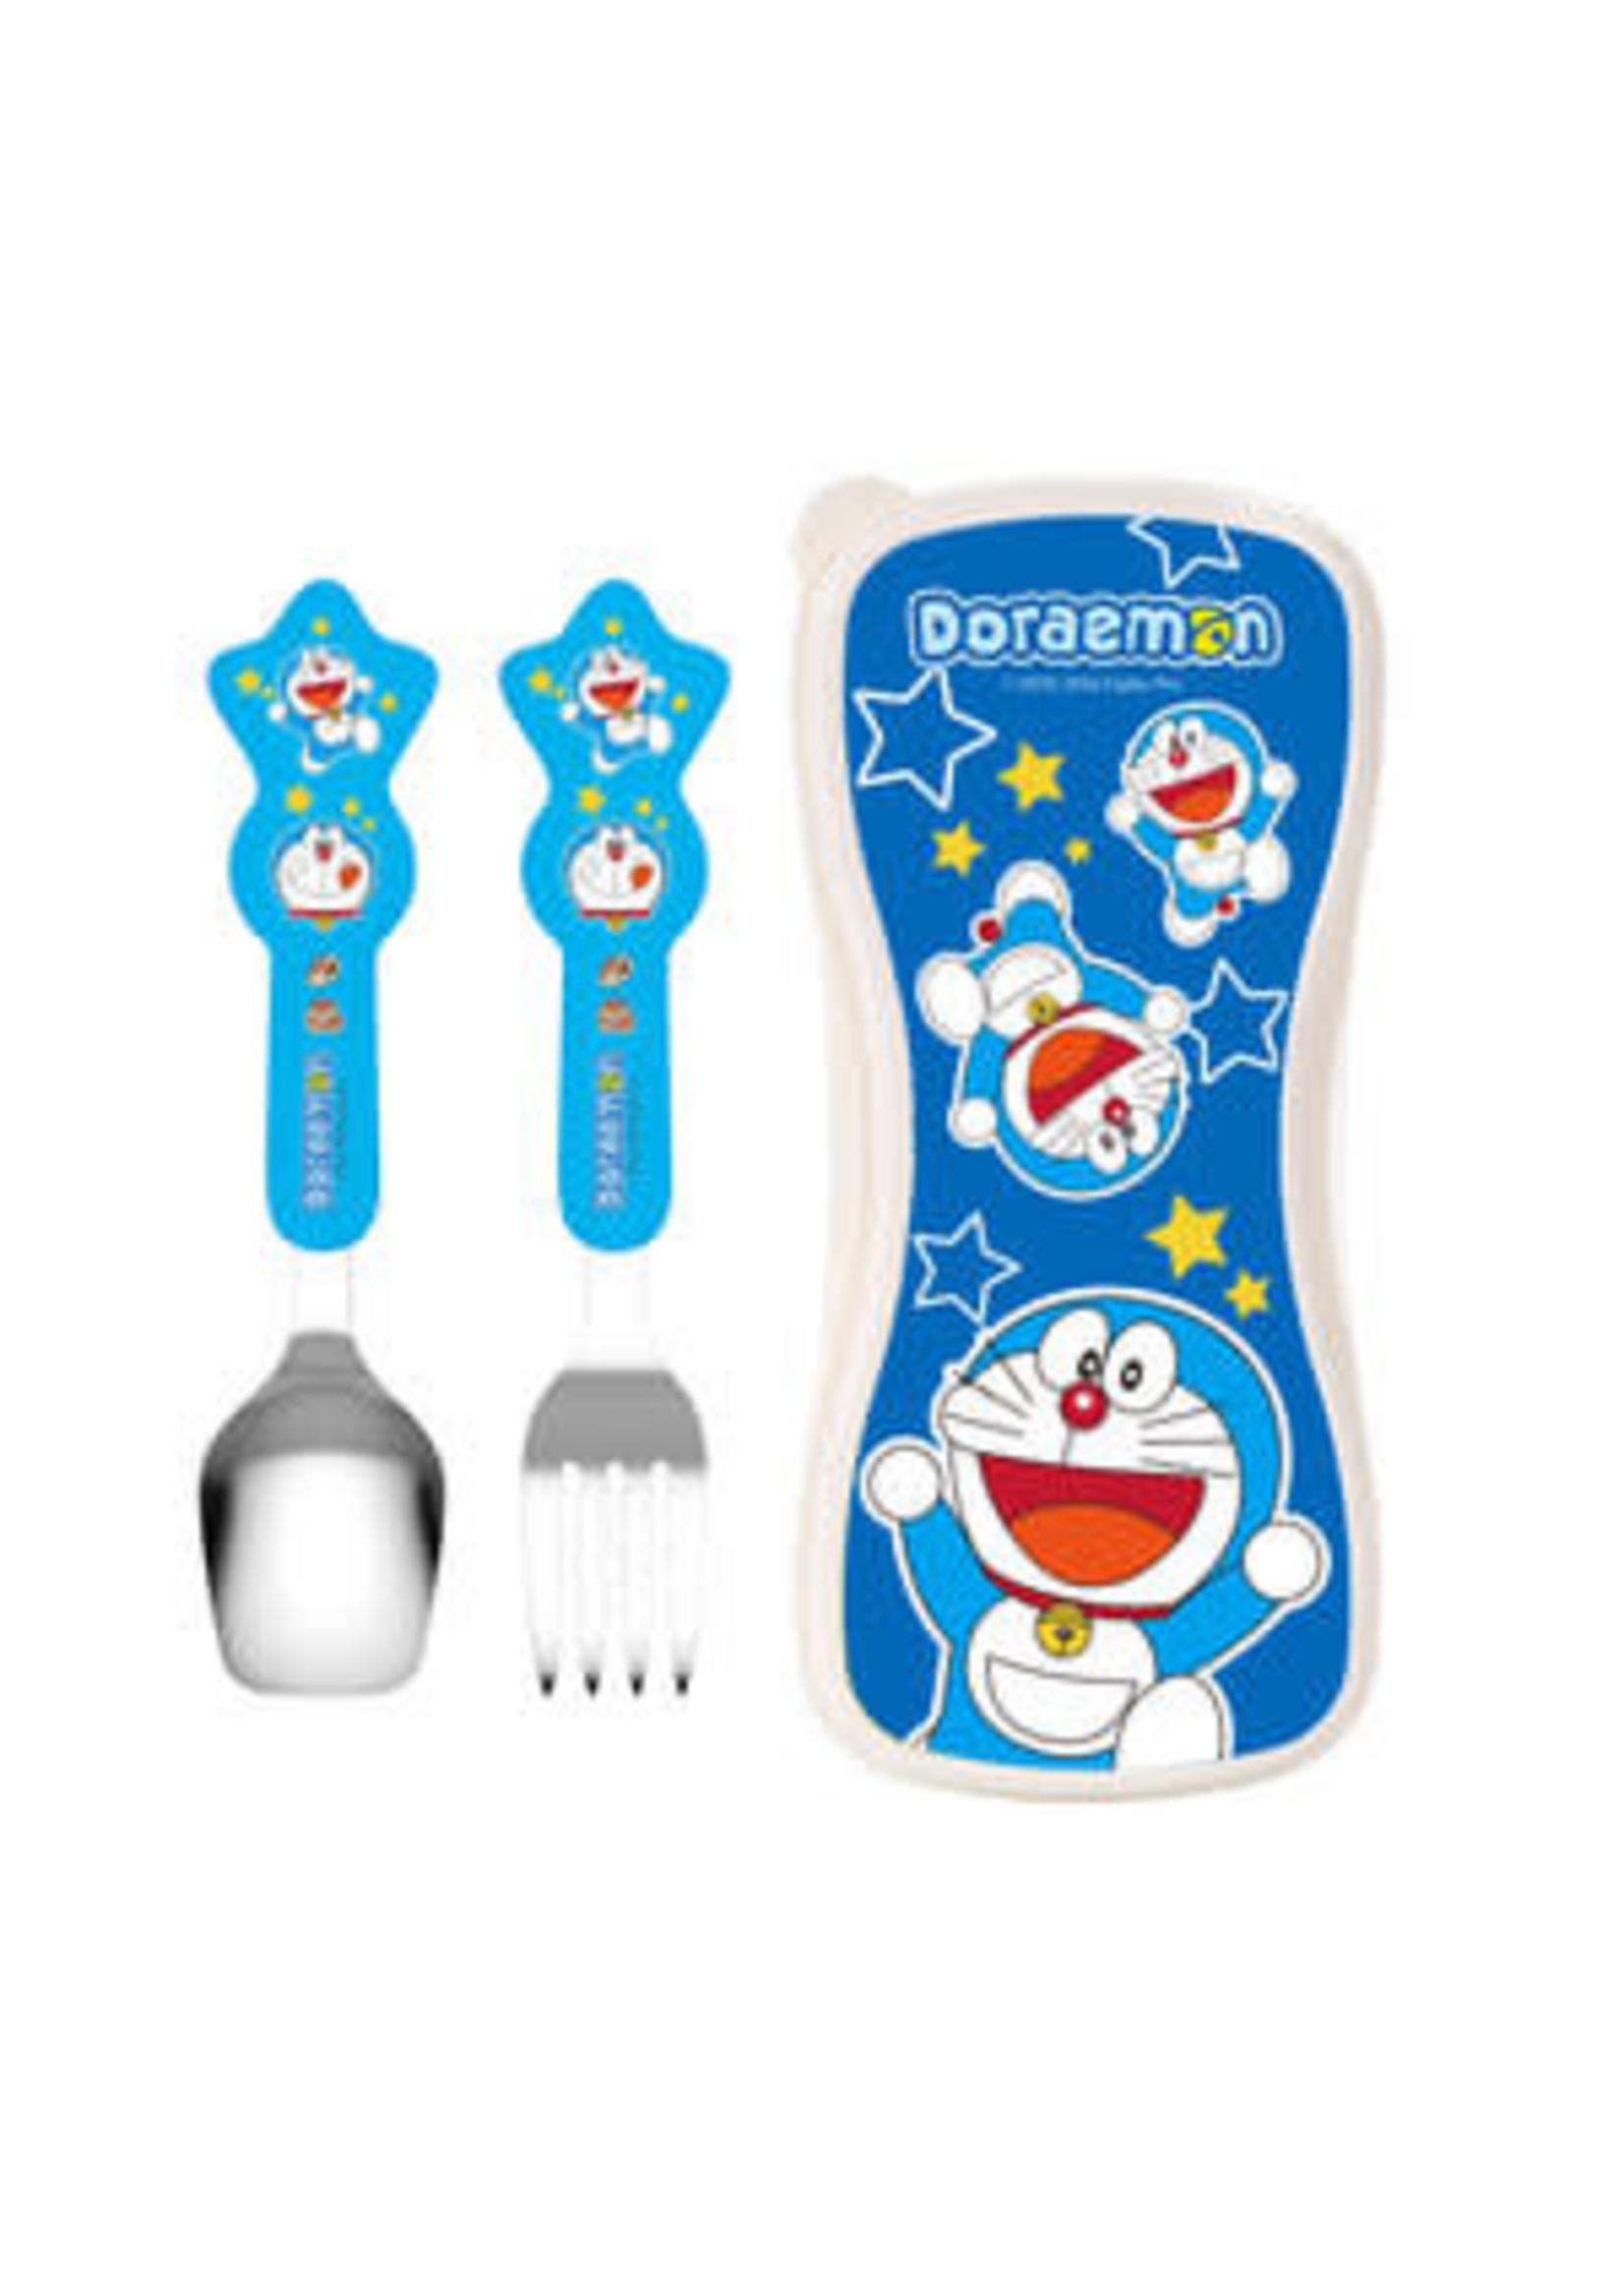 Edison Friends Edison Doraemon Spoon & Fork Set Case